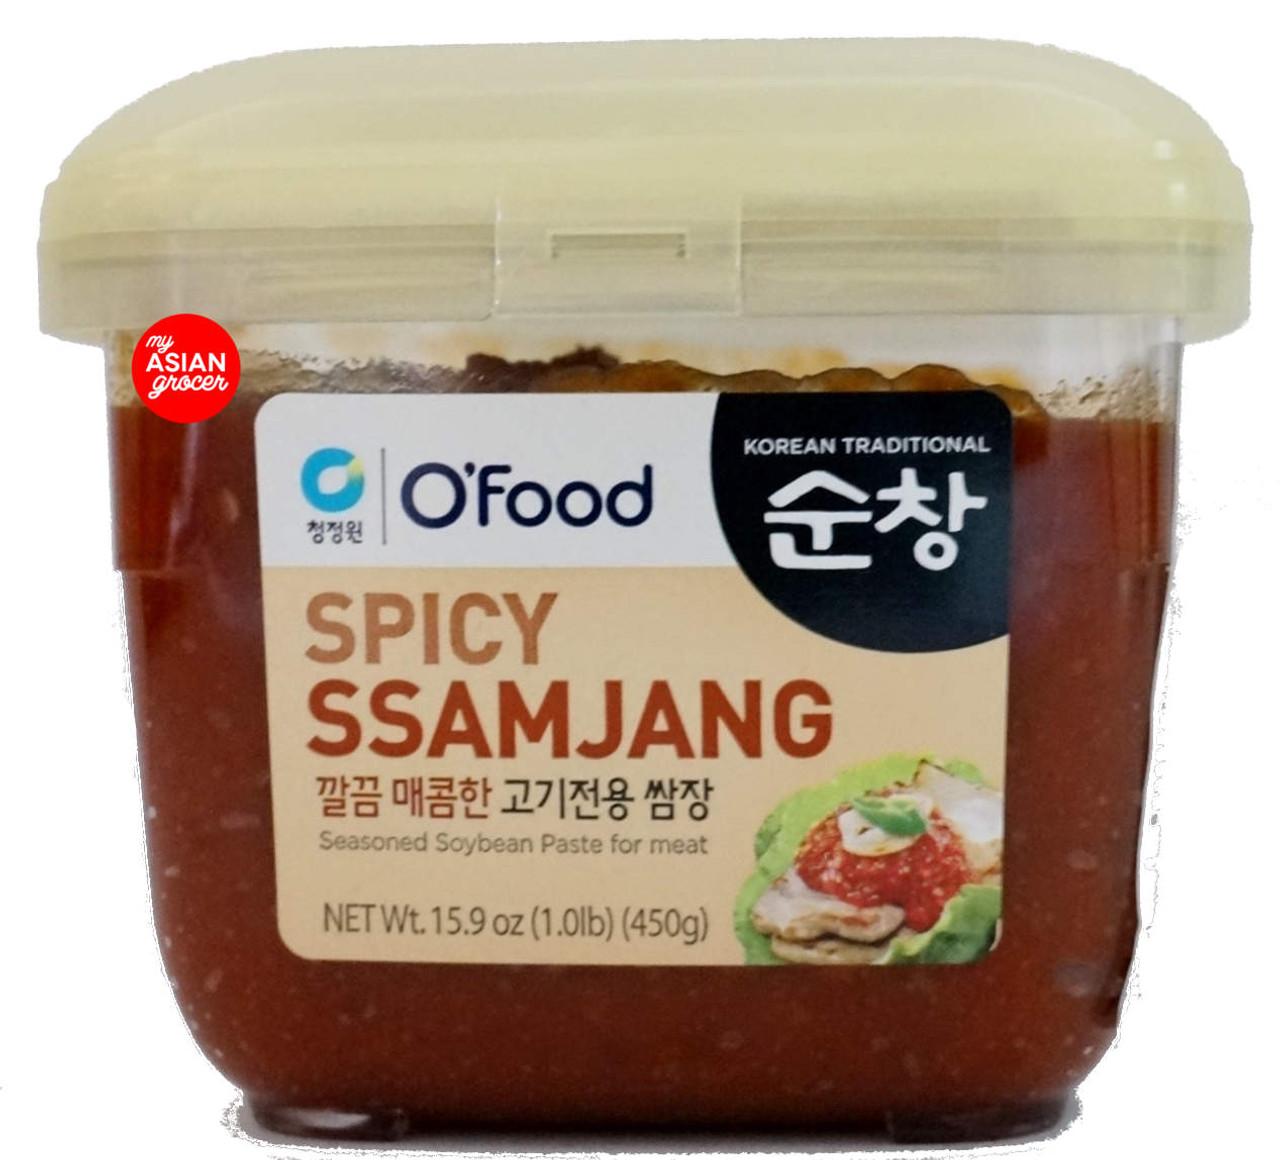 O'Food Spicy Ssamjang 450g